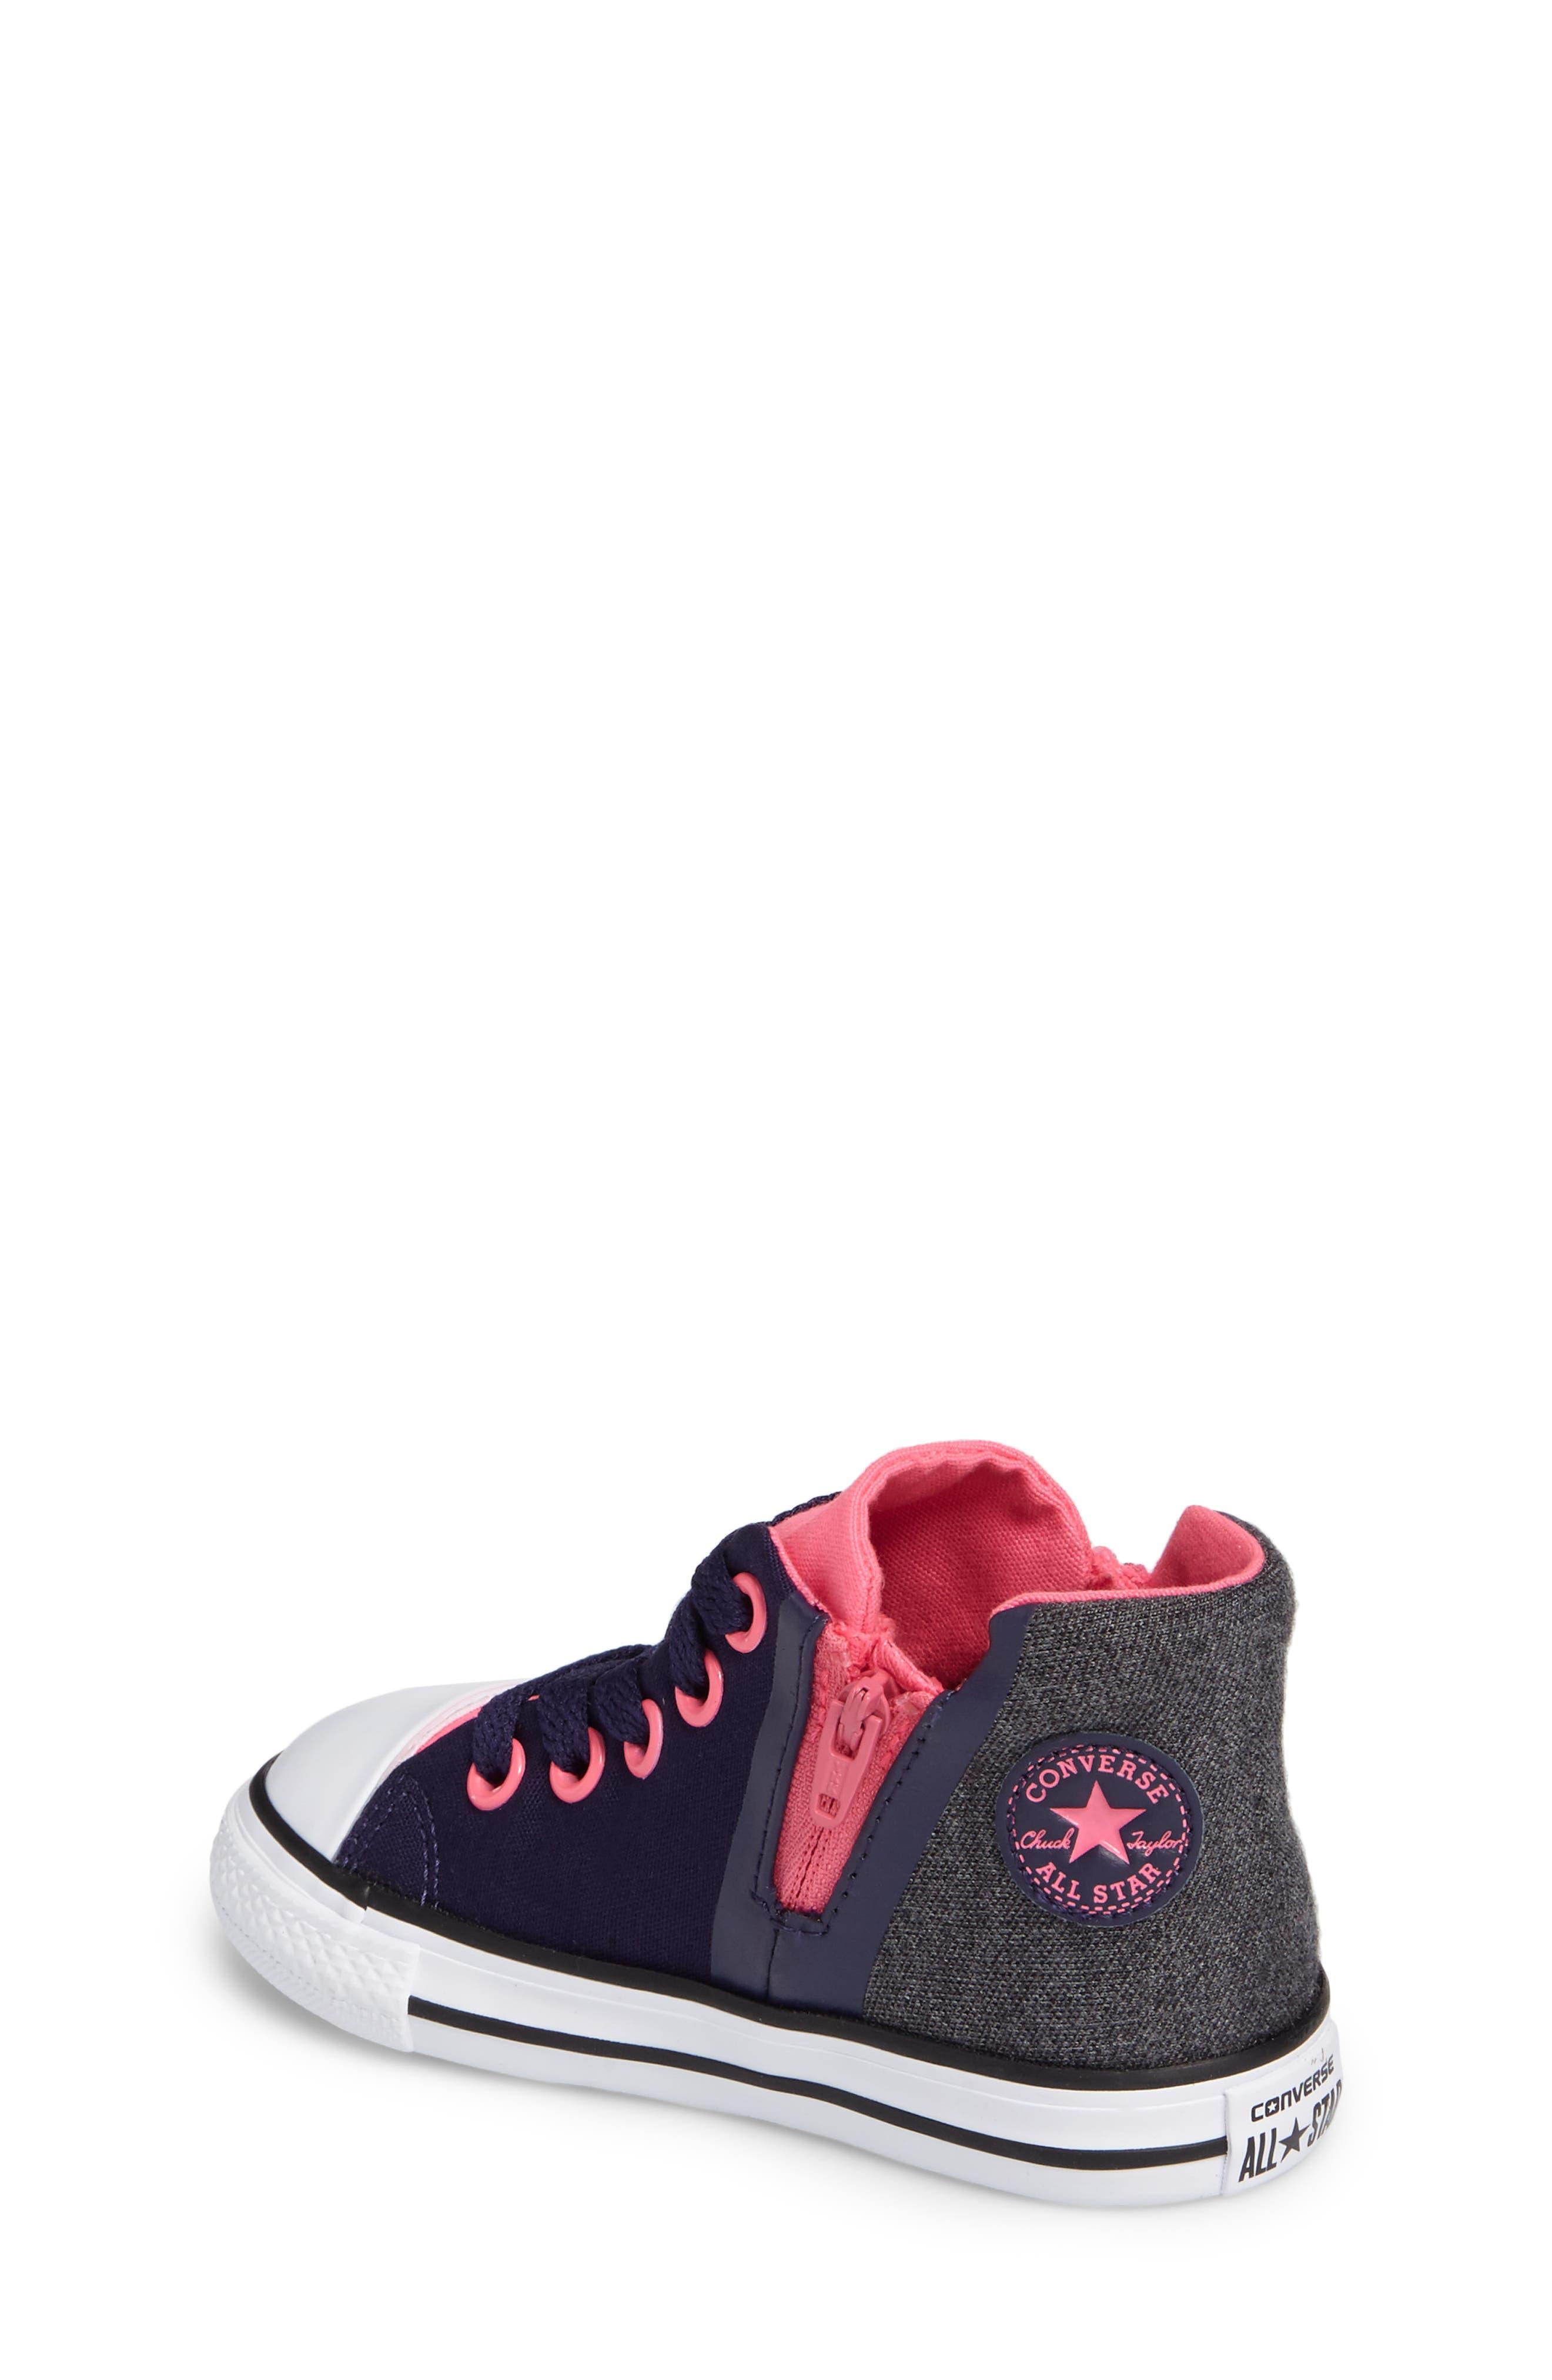 Alternate Image 2  - Converse Chuck Taylor® All Star® Sport Zip High Top Sneaker (Baby, Walker, Toddler, Little Kid & Big Kid)